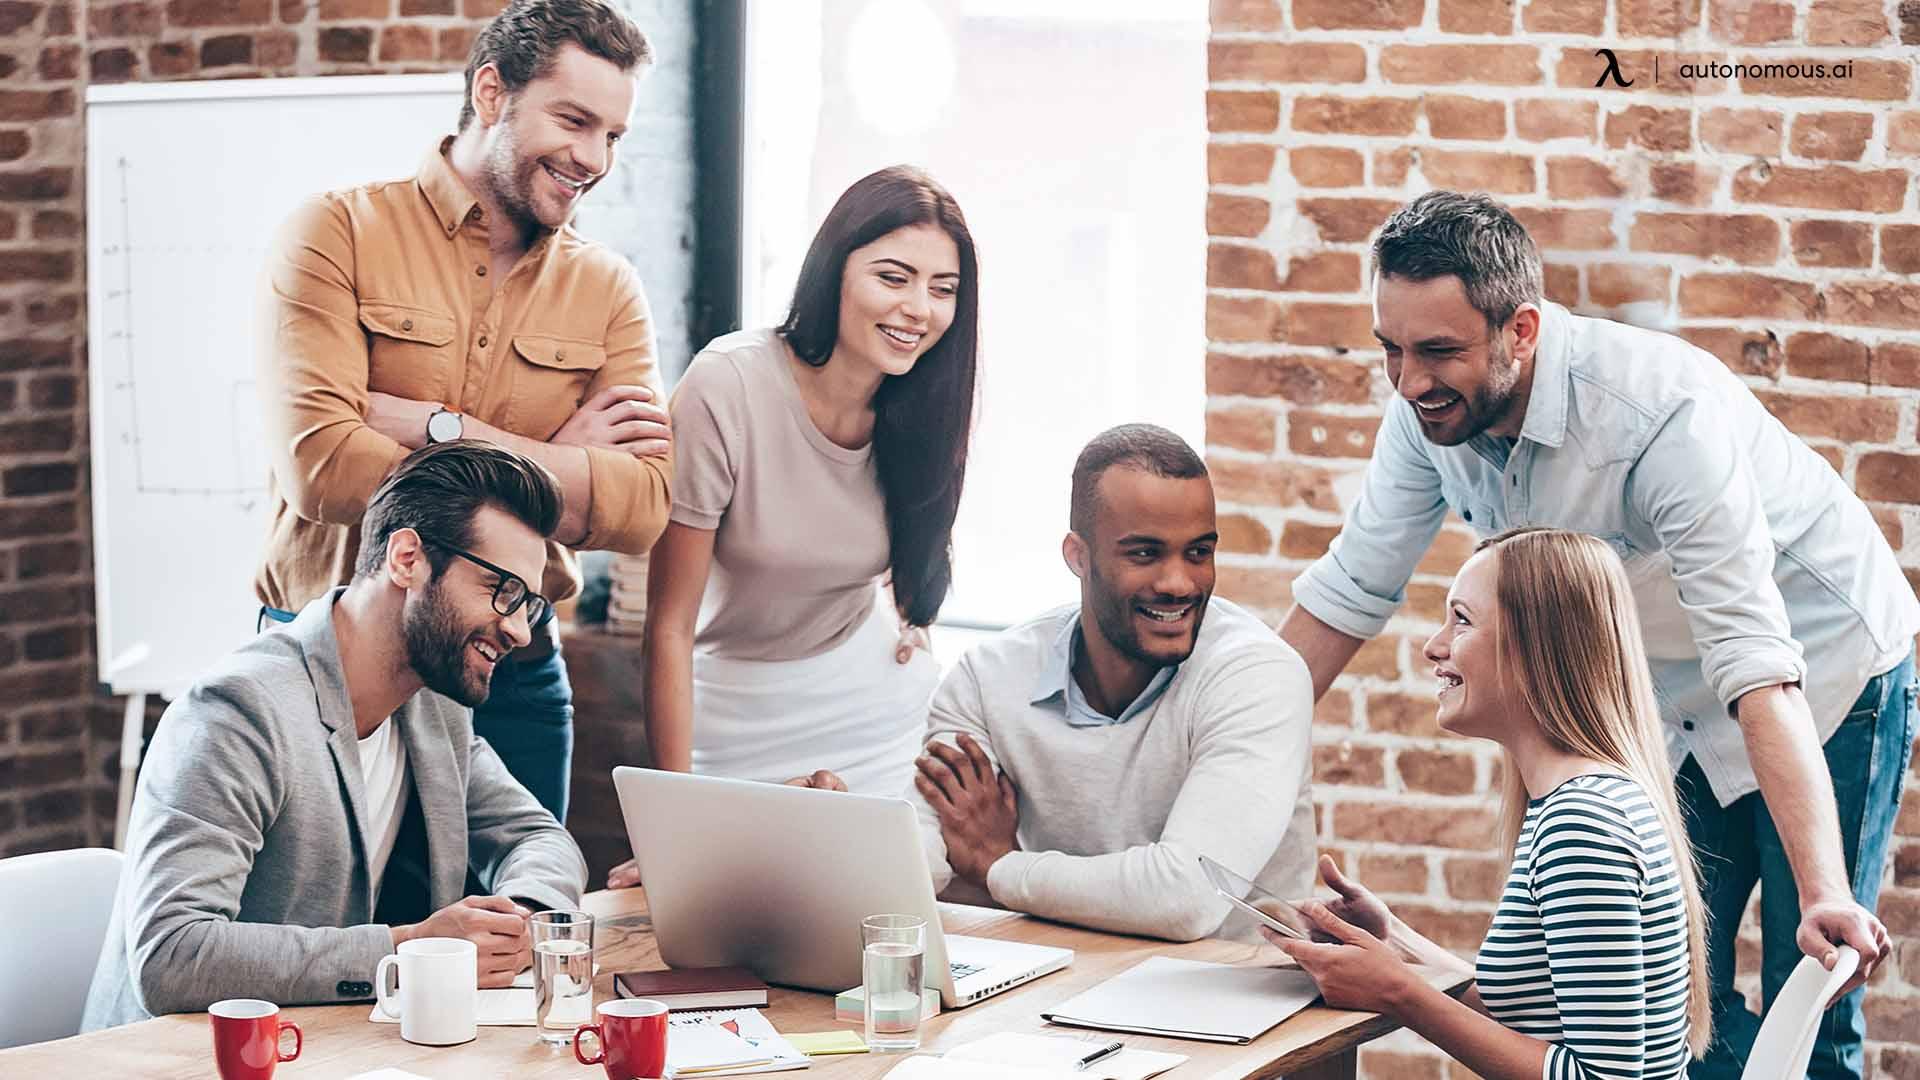 Benefits of Individual Social Awareness to a Group